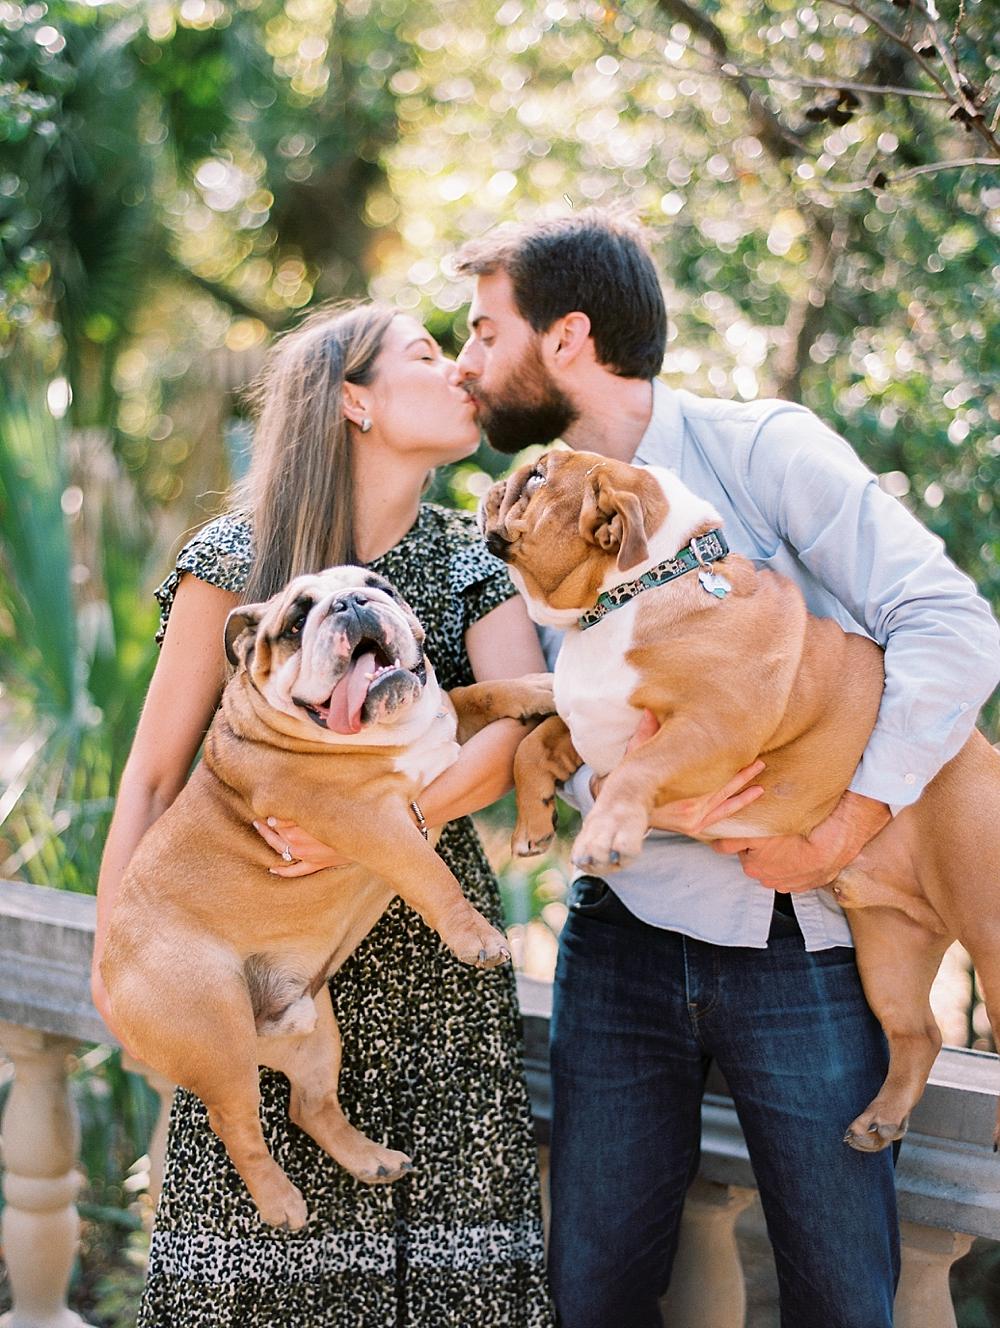 kristin-la-voie-photography-Austin-Wedding-Photographer-laguna-gloria-commodore-perry-estate-engagement-11